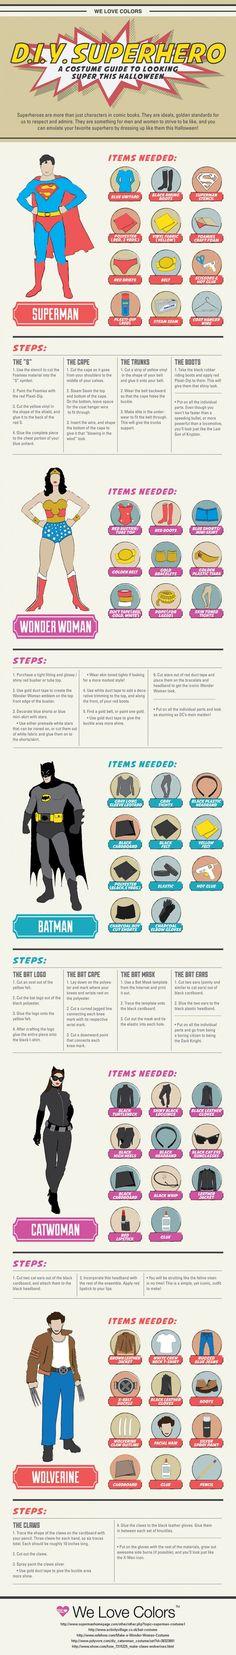 Do It Yourself Superhero Costumes Infographic